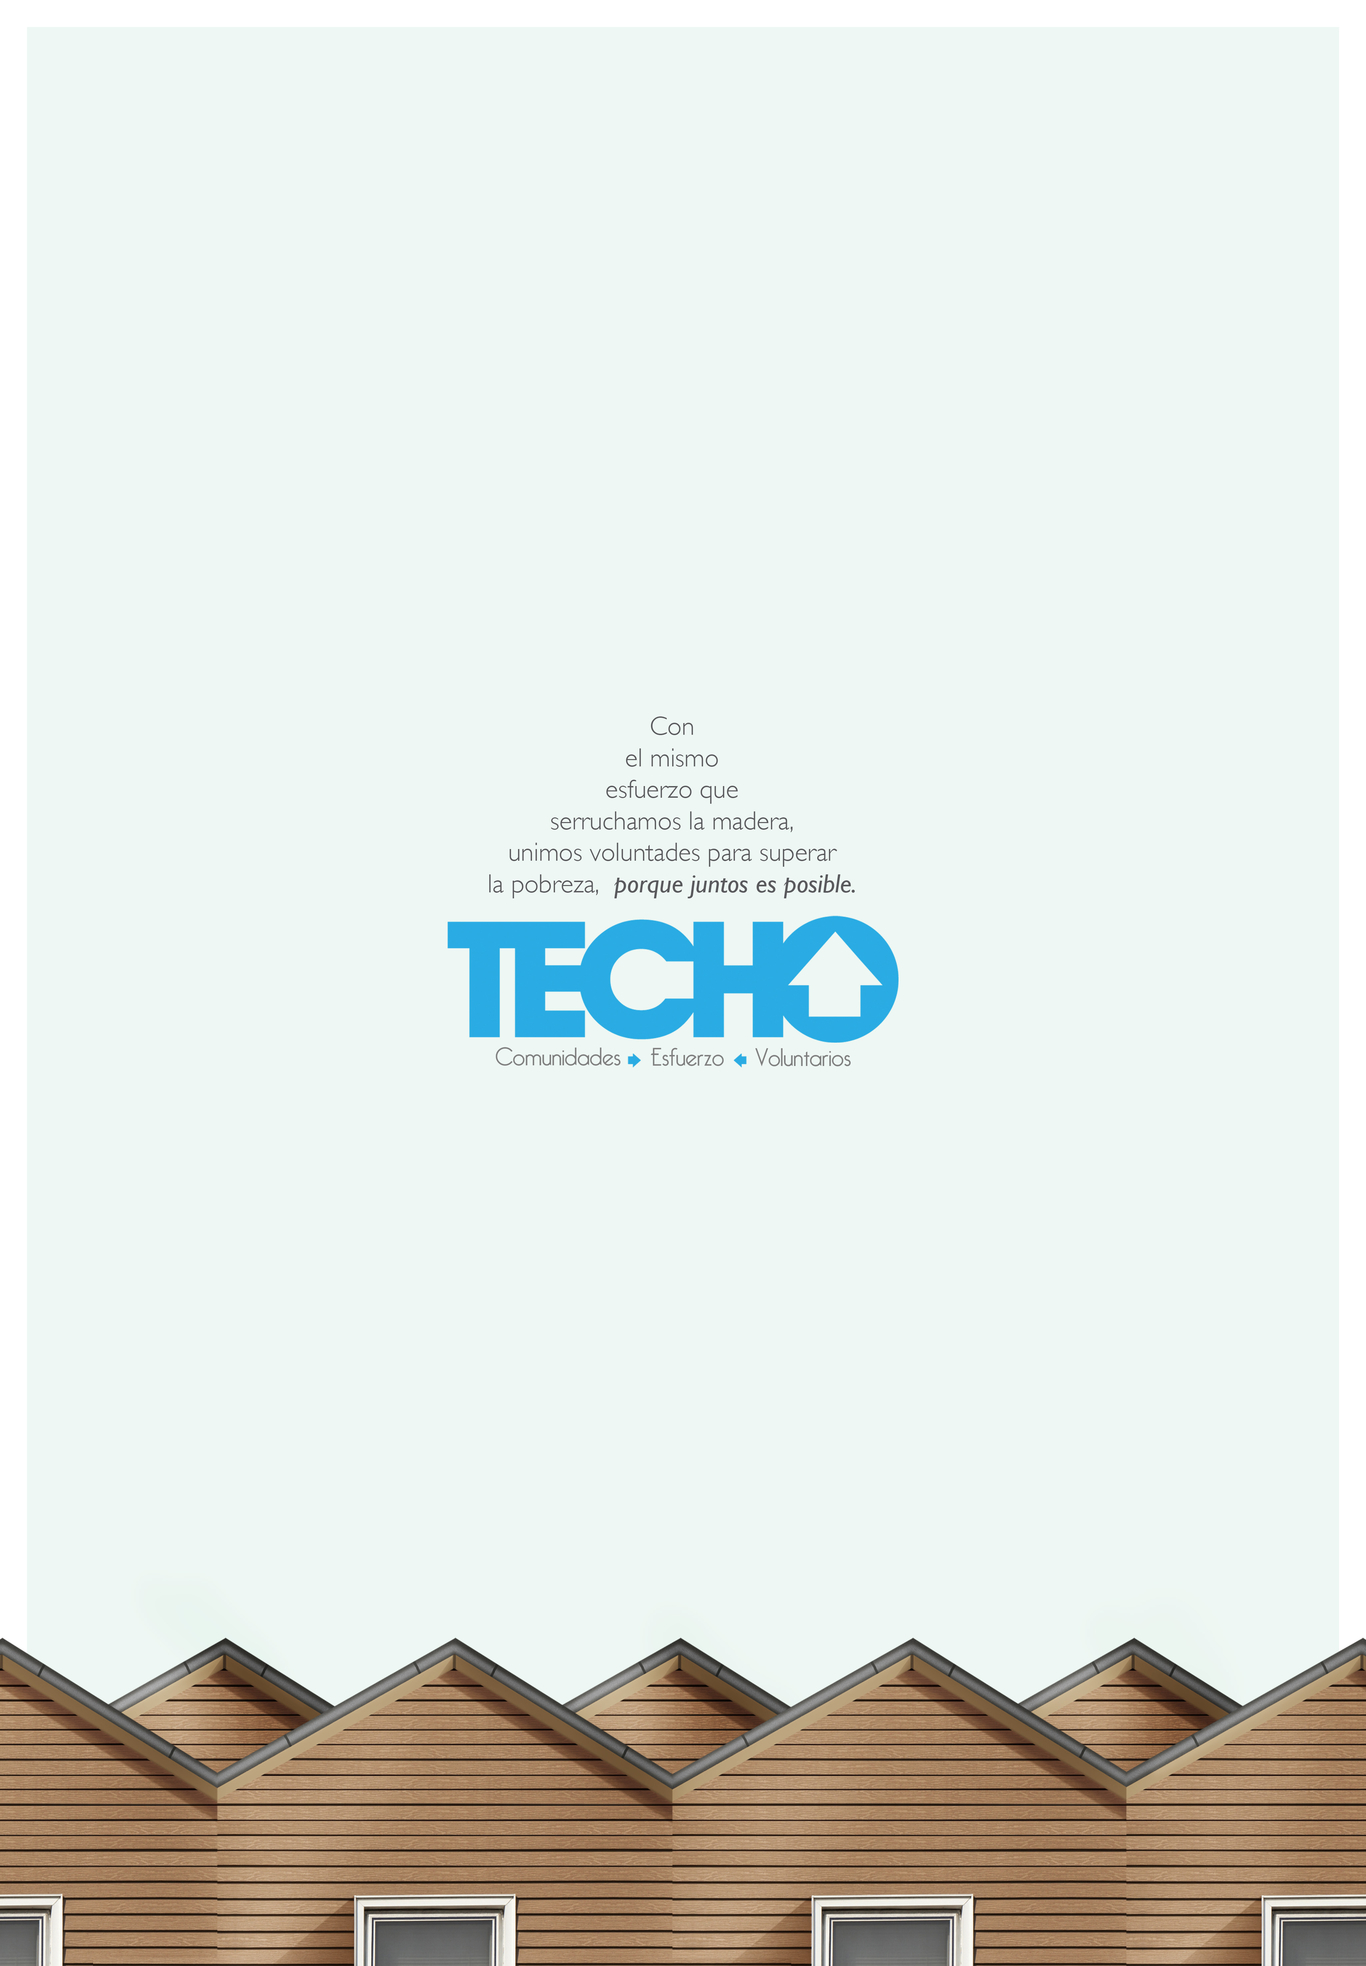 Tacorco techo ad 1 2ed7e901 nqov